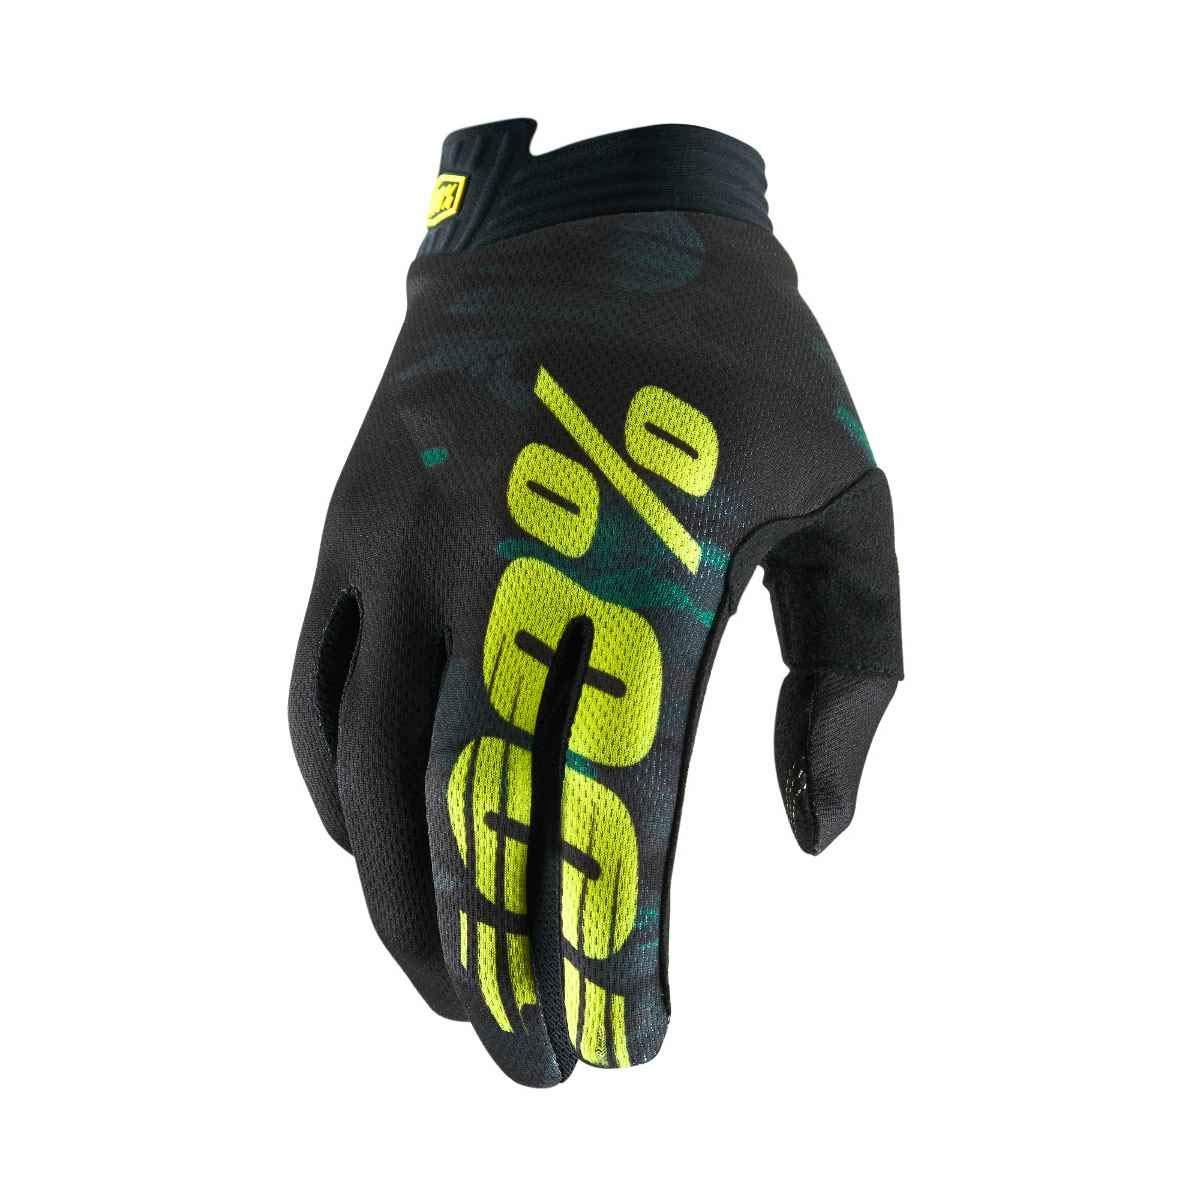 100% Prozent iTrack Handschuhe Clarino MTB DH MX Motocross Enduro Offroad Quad, HU-GLO-0002, Farbe Schwarz Grau, Größe XL Größe XL HP-10015-057-13